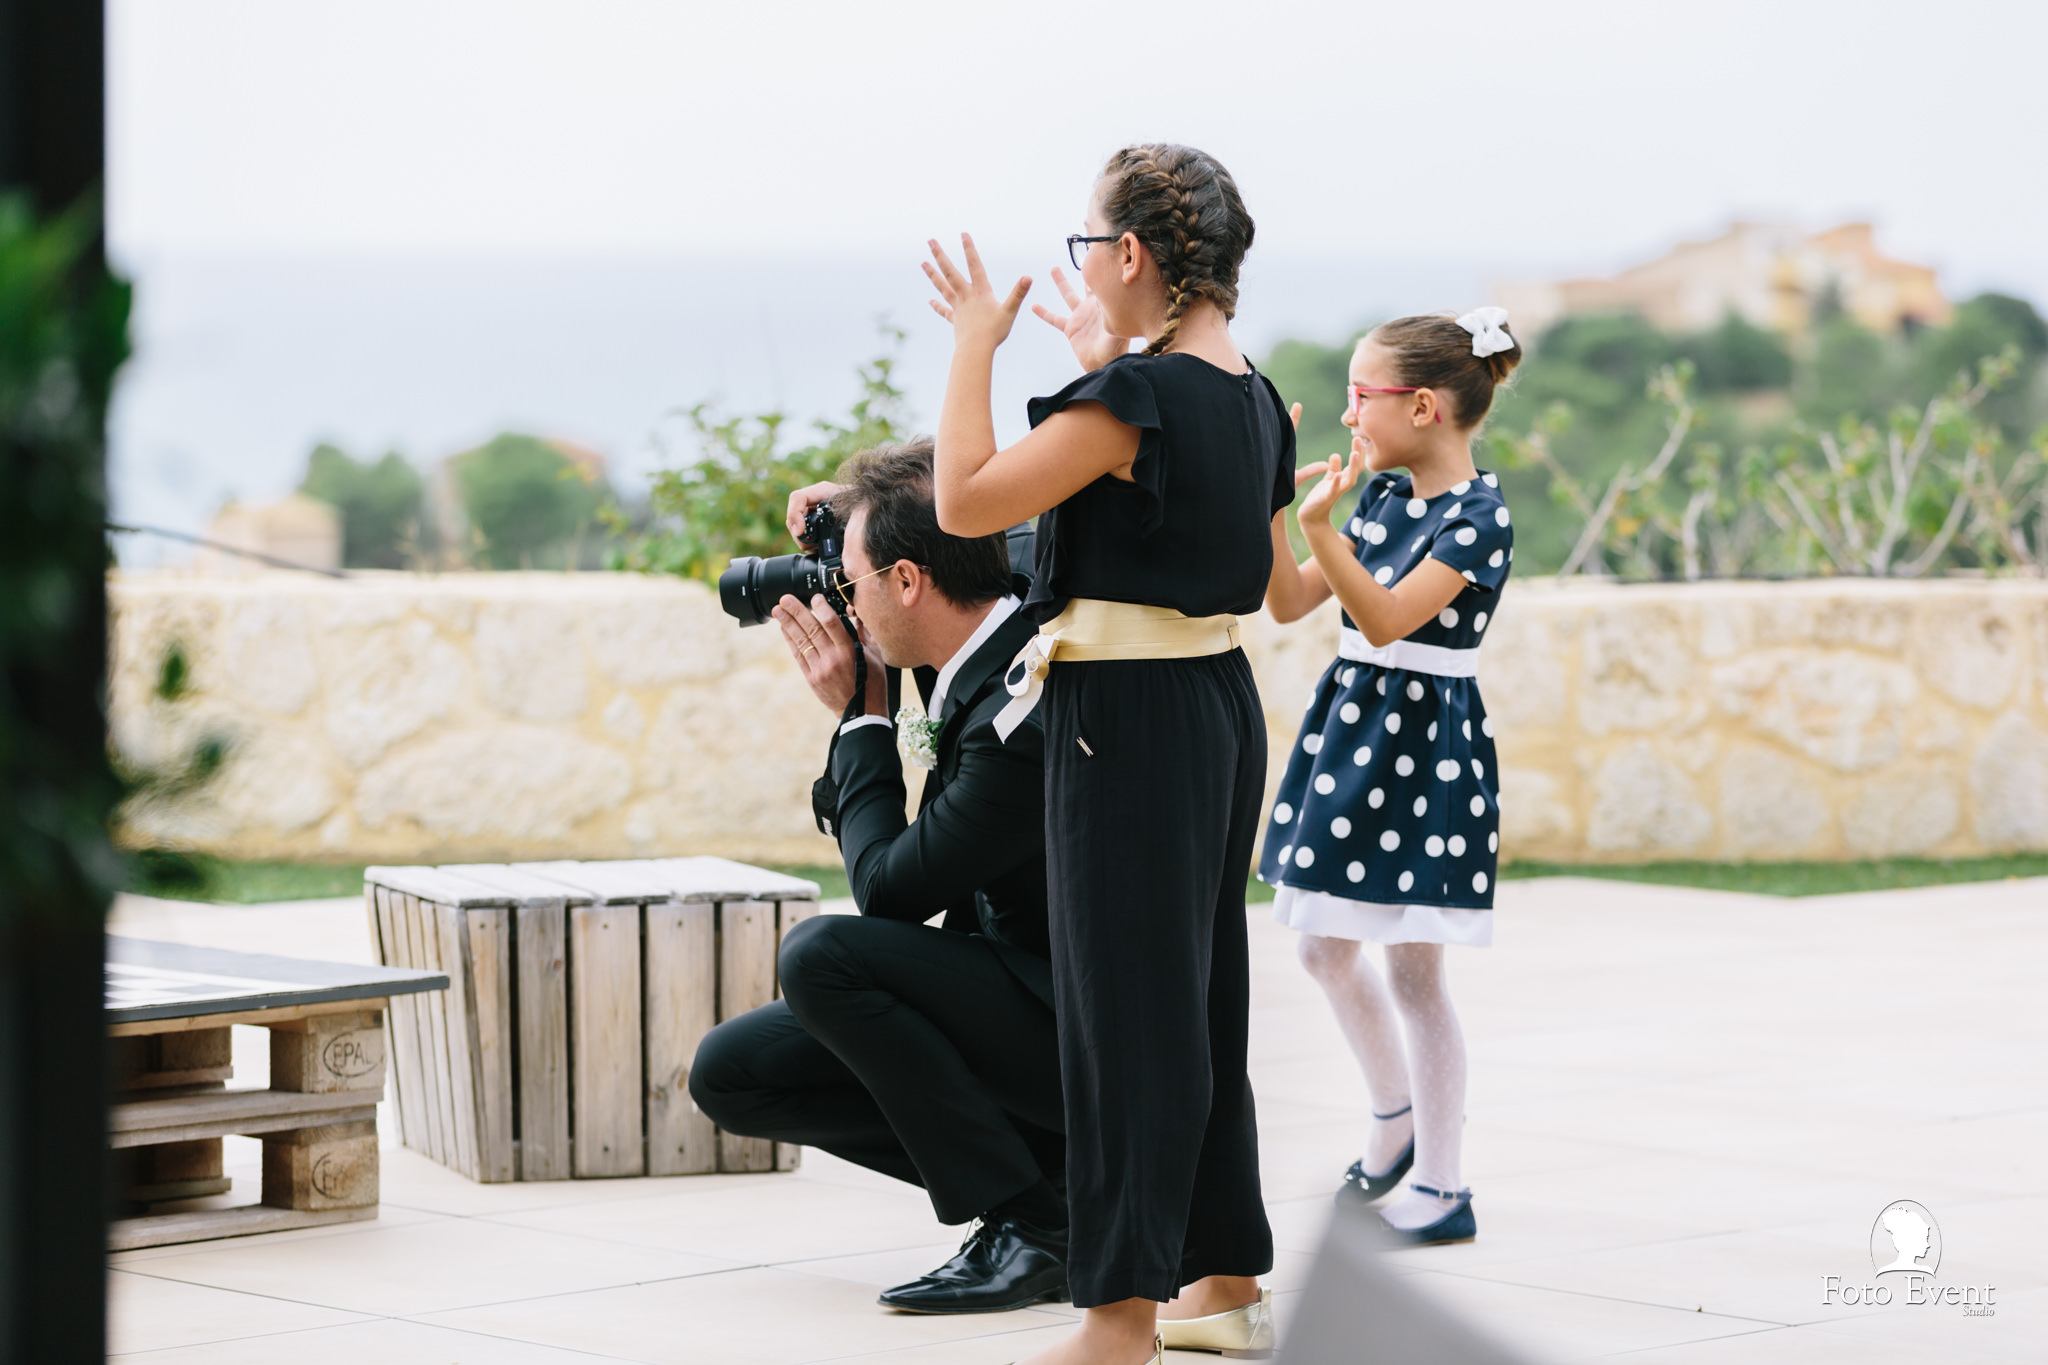 027-2020-10-15-Matrimonio-Noemi-e-Salvatore-Paterno-zoom-305